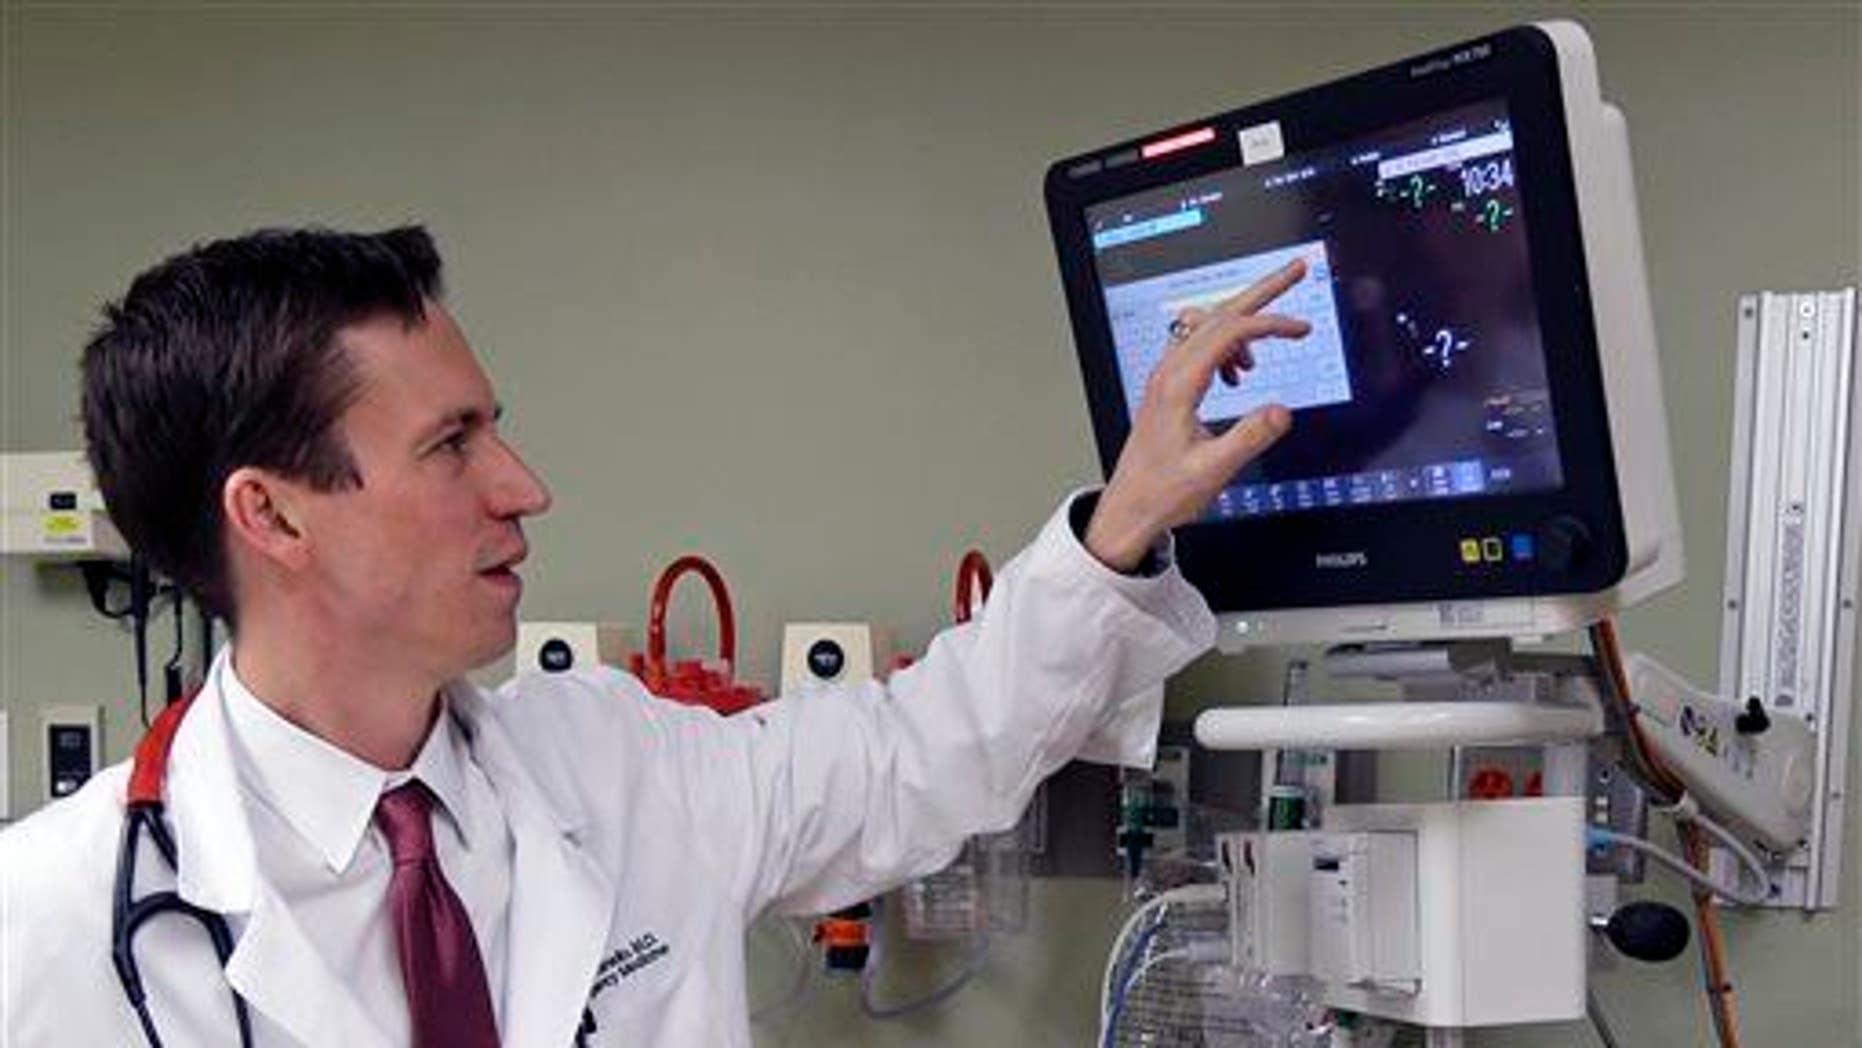 In this Feb. 11, 2014, photo, Dr. Marcus Romanello, checks equipment in the emergency room of Fort Hamilton Hospital in Hamilton, Ohio.